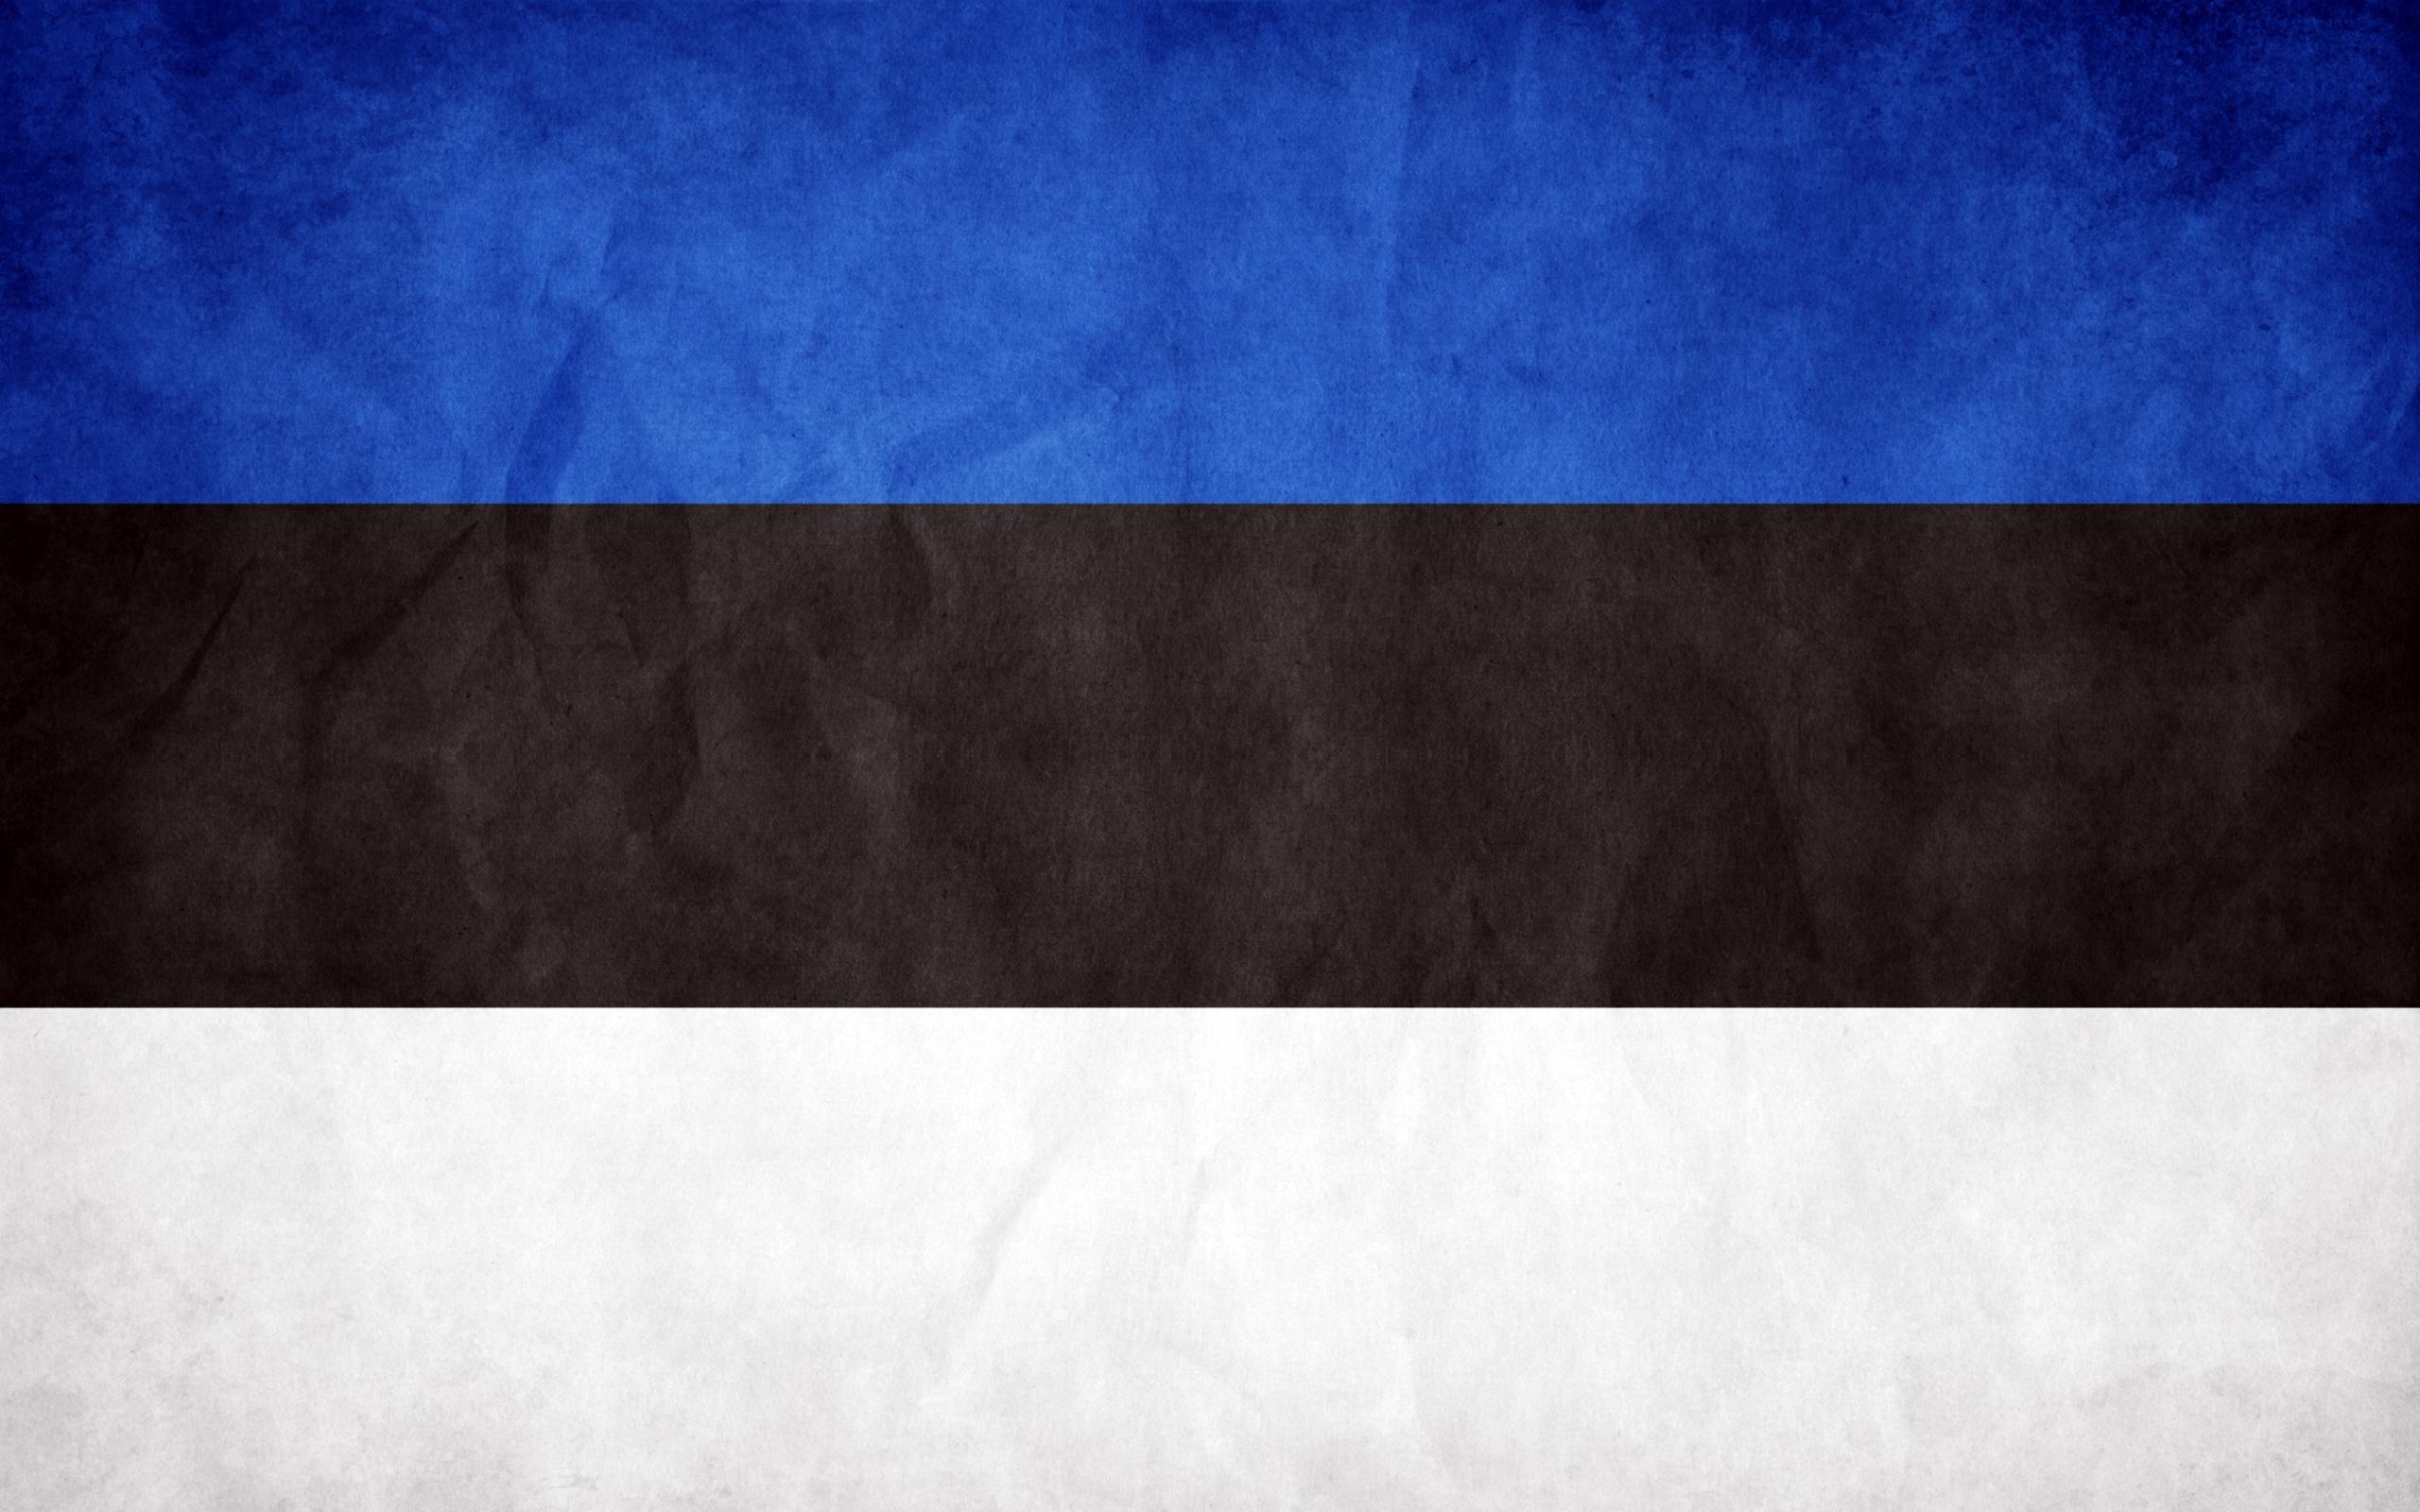 Estonia-Grunge-Flag